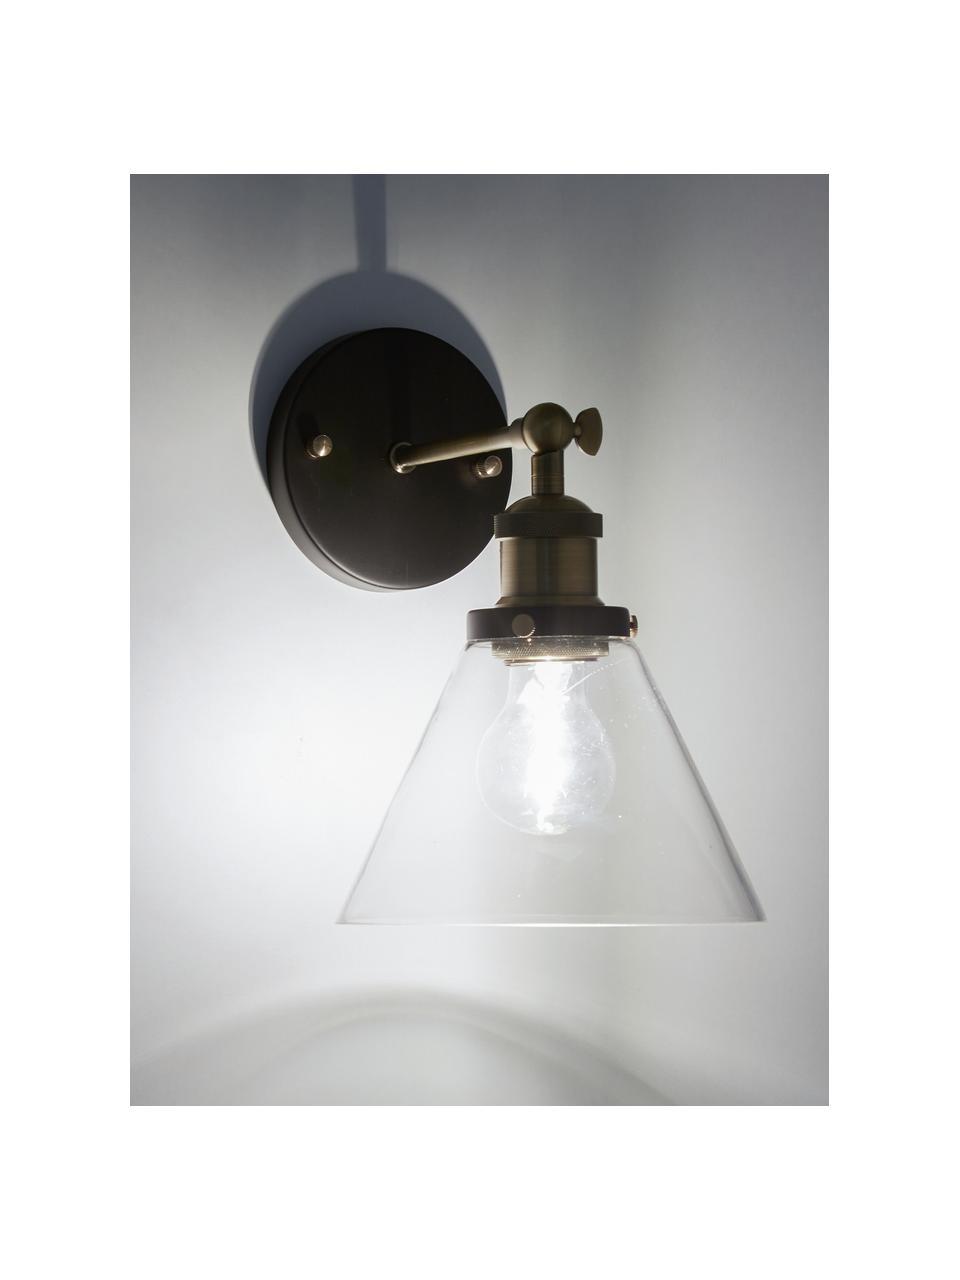 Lampada da parete New York Loft No.1, Baldacchino: metallo verniciato a polv, Paralume: vetro, Nero, ottone trasparente, Larg. 19 x Alt. 29 cm